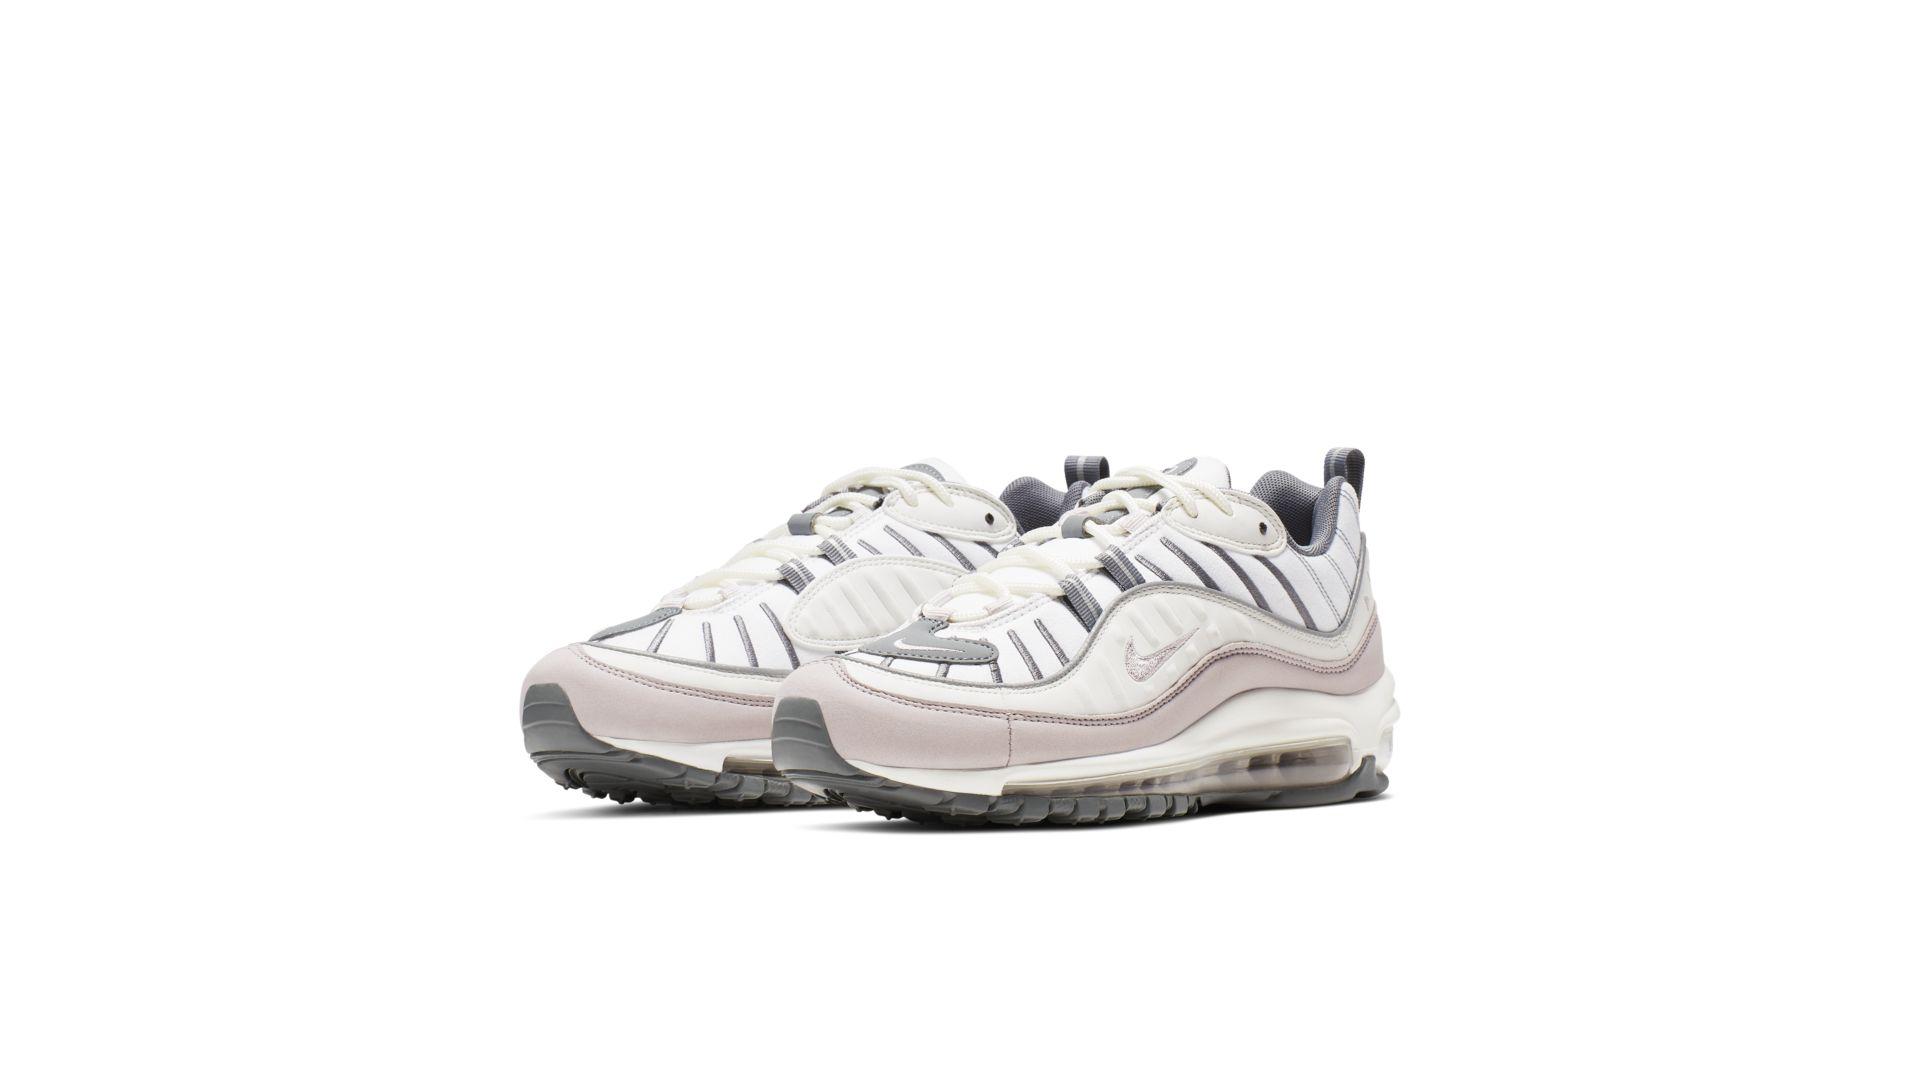 Nike WMNS Air Max 98 'Violet Ash' (AH6799 111)